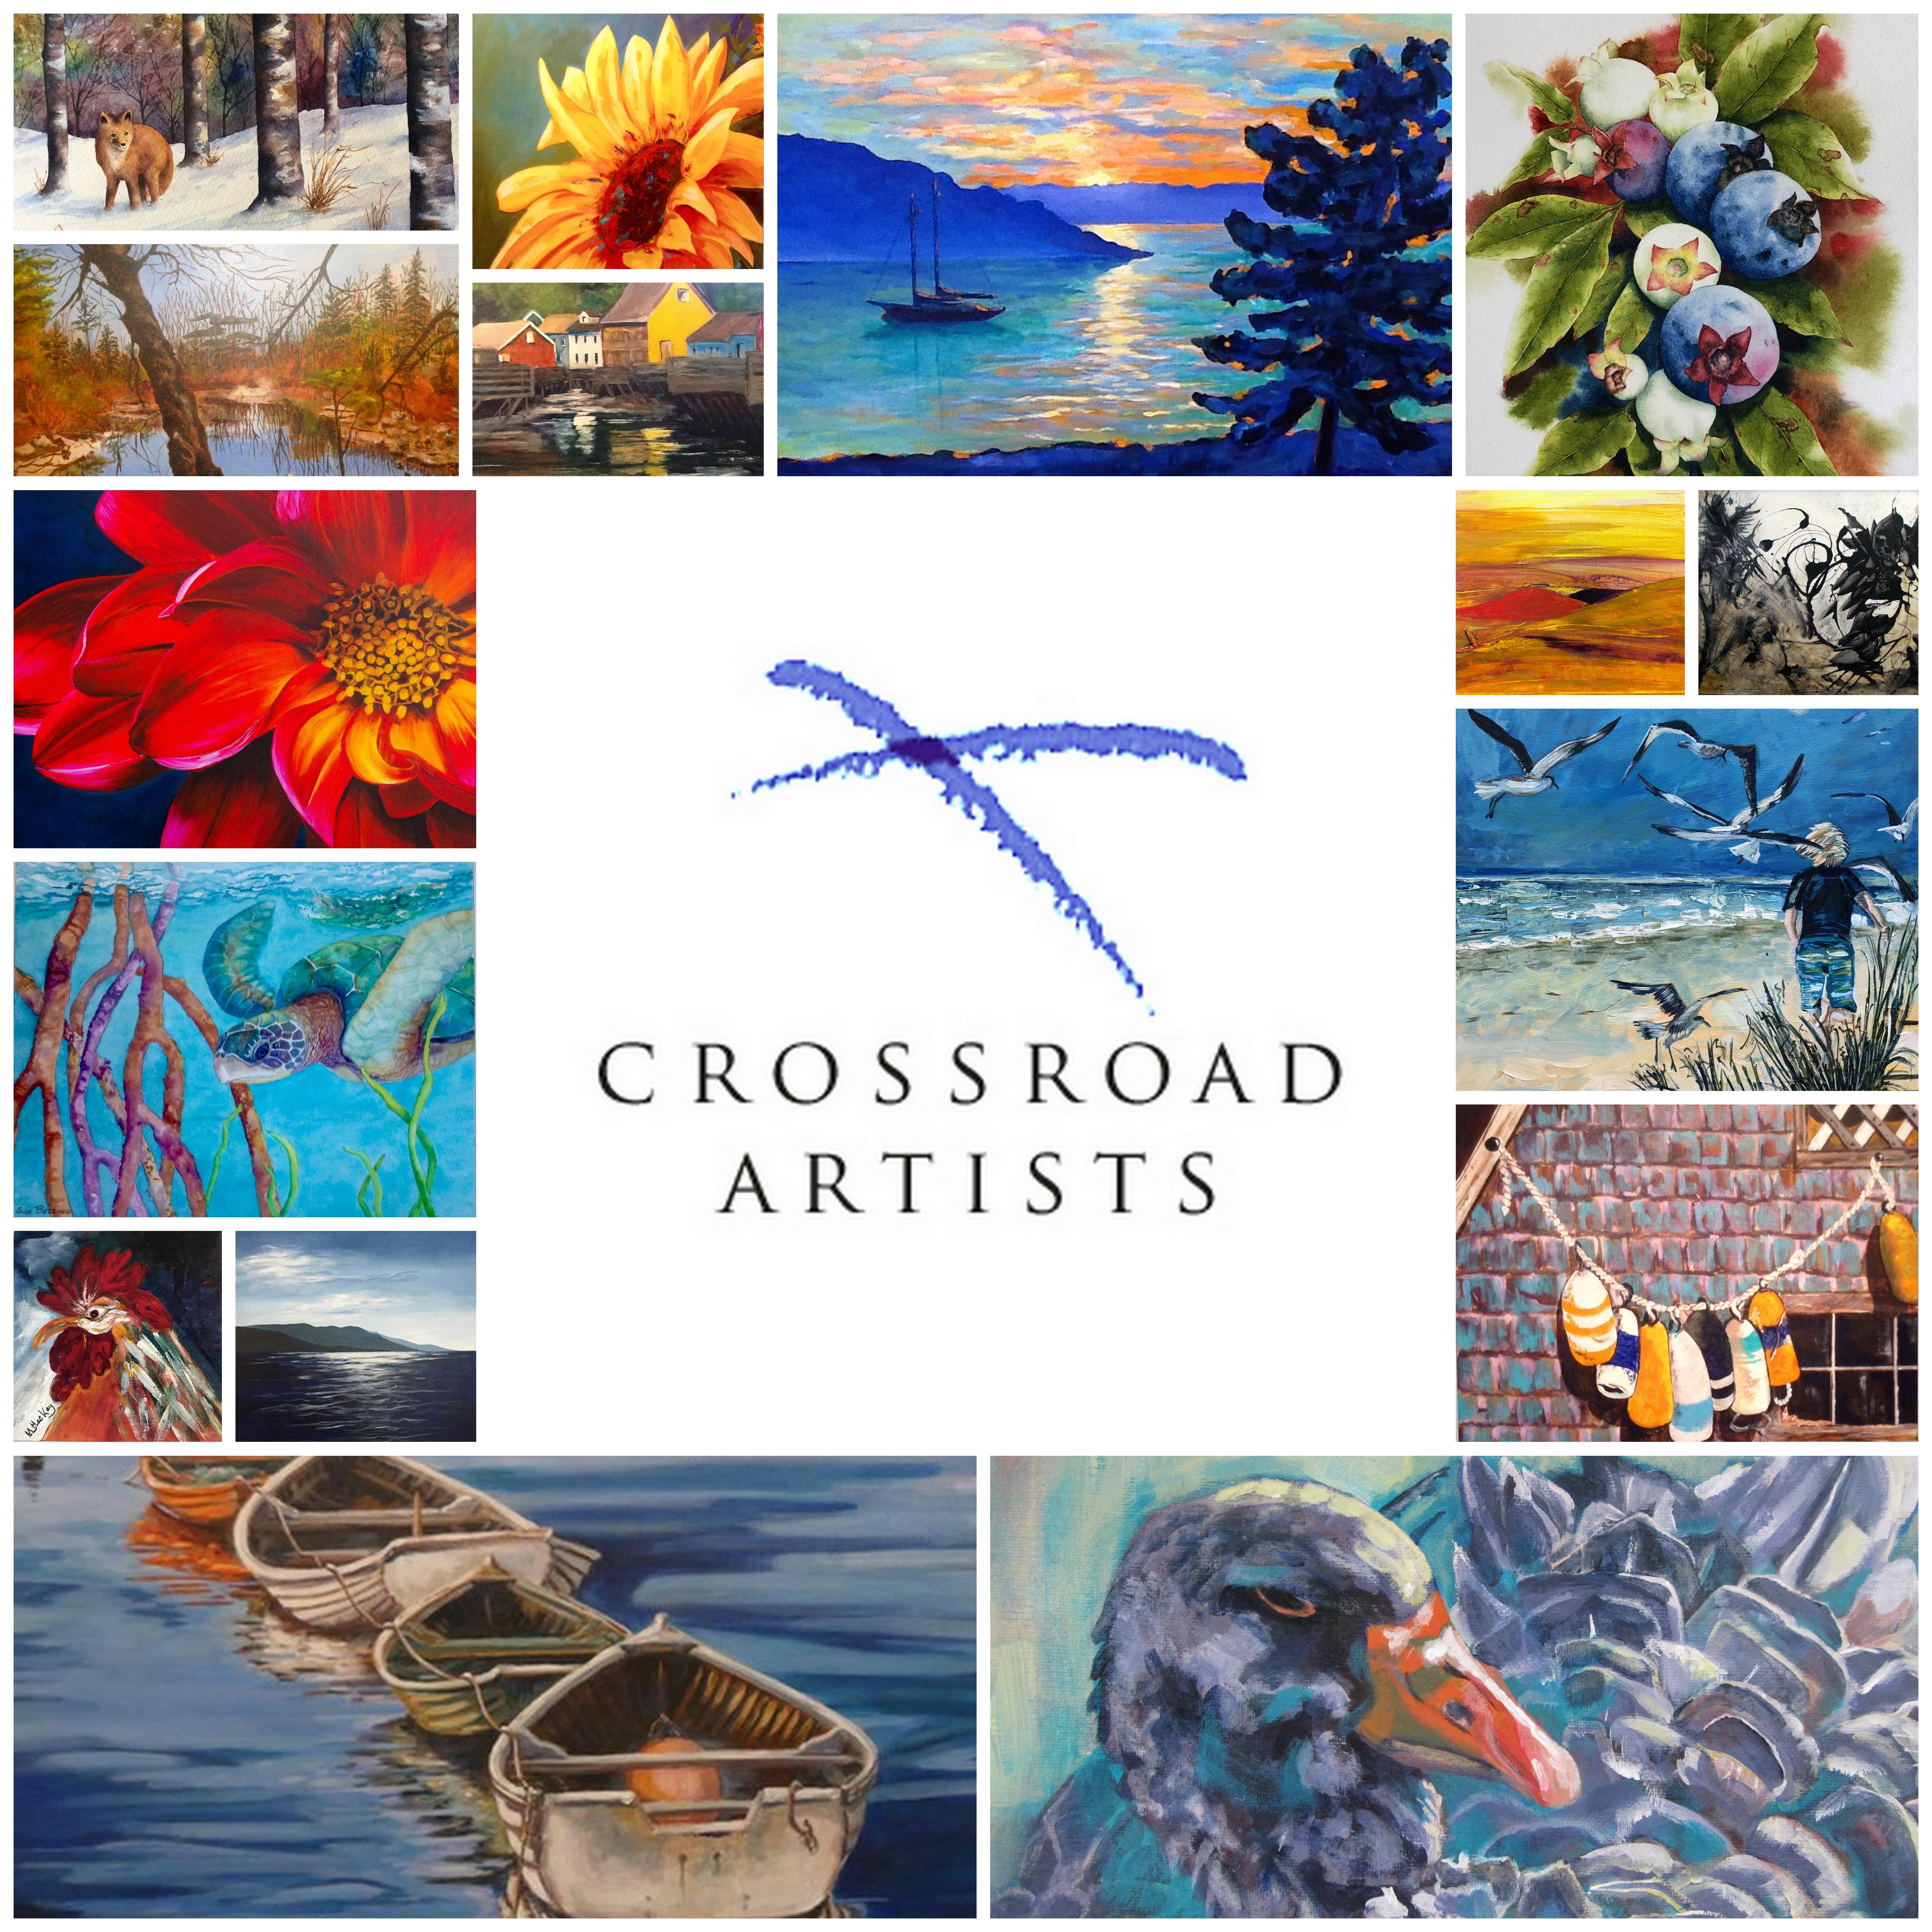 Crossroad Artists